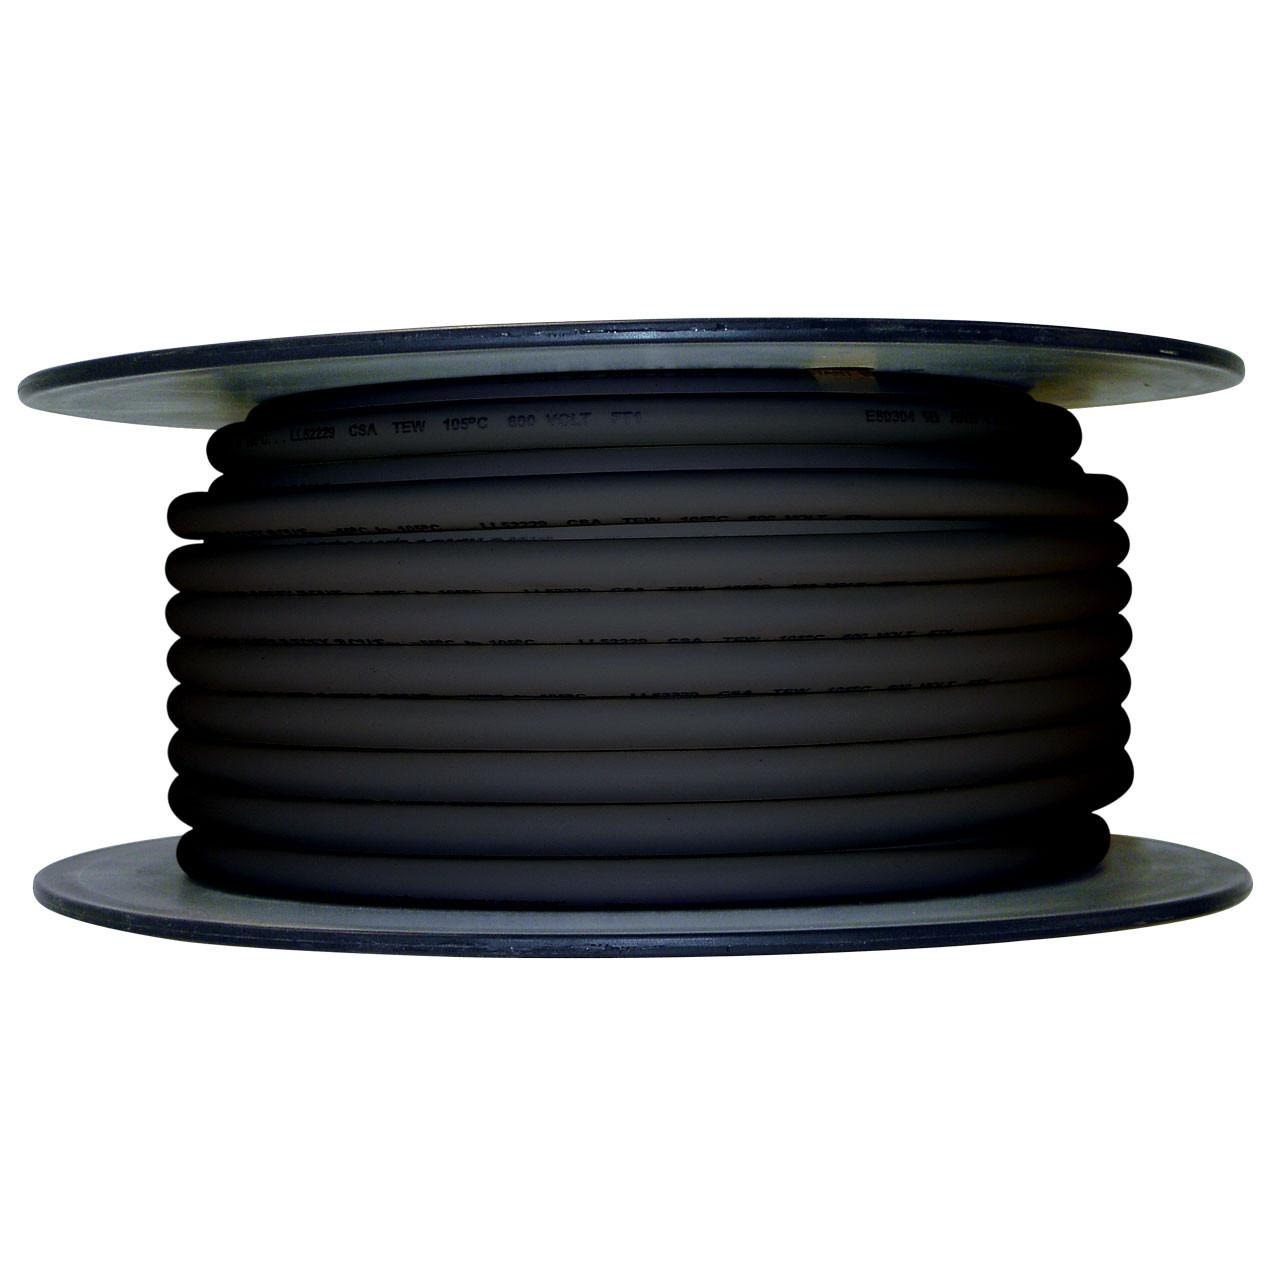 ARCTIC ULTRAFLEX 4GA BLACK 100 FOOT ROLL